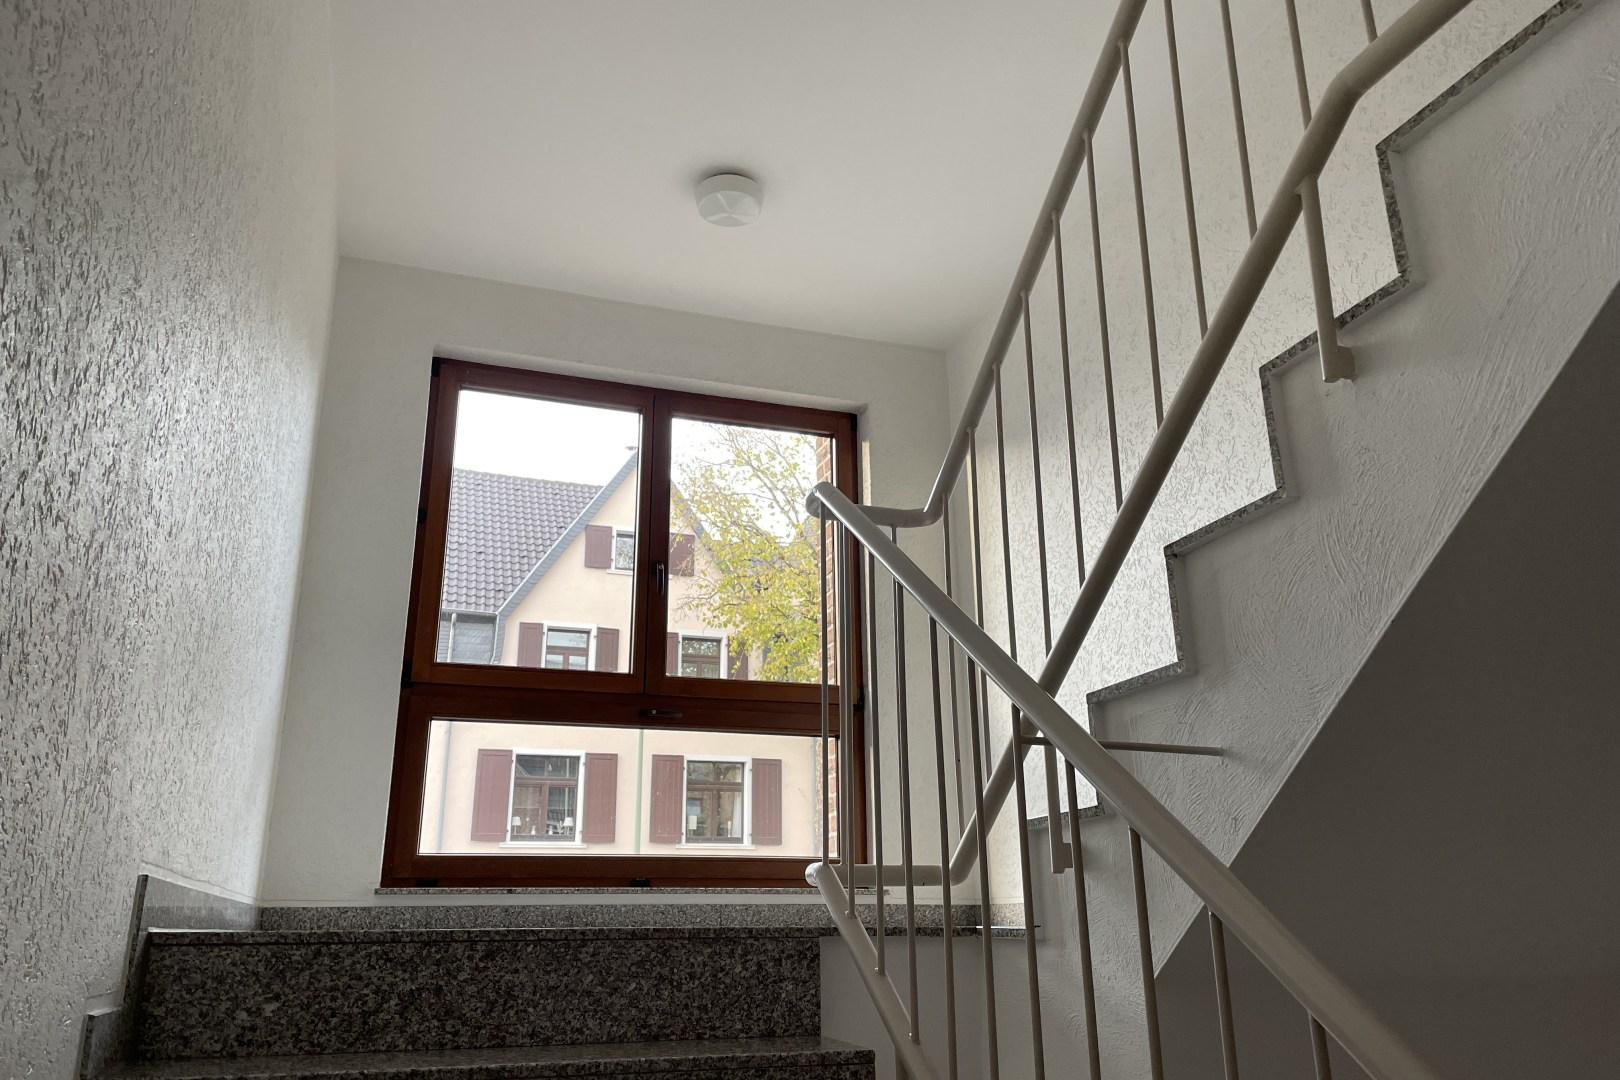 Immobilie Nr.0258 | Uerdinger Straße 21, 40668 Meerbusch